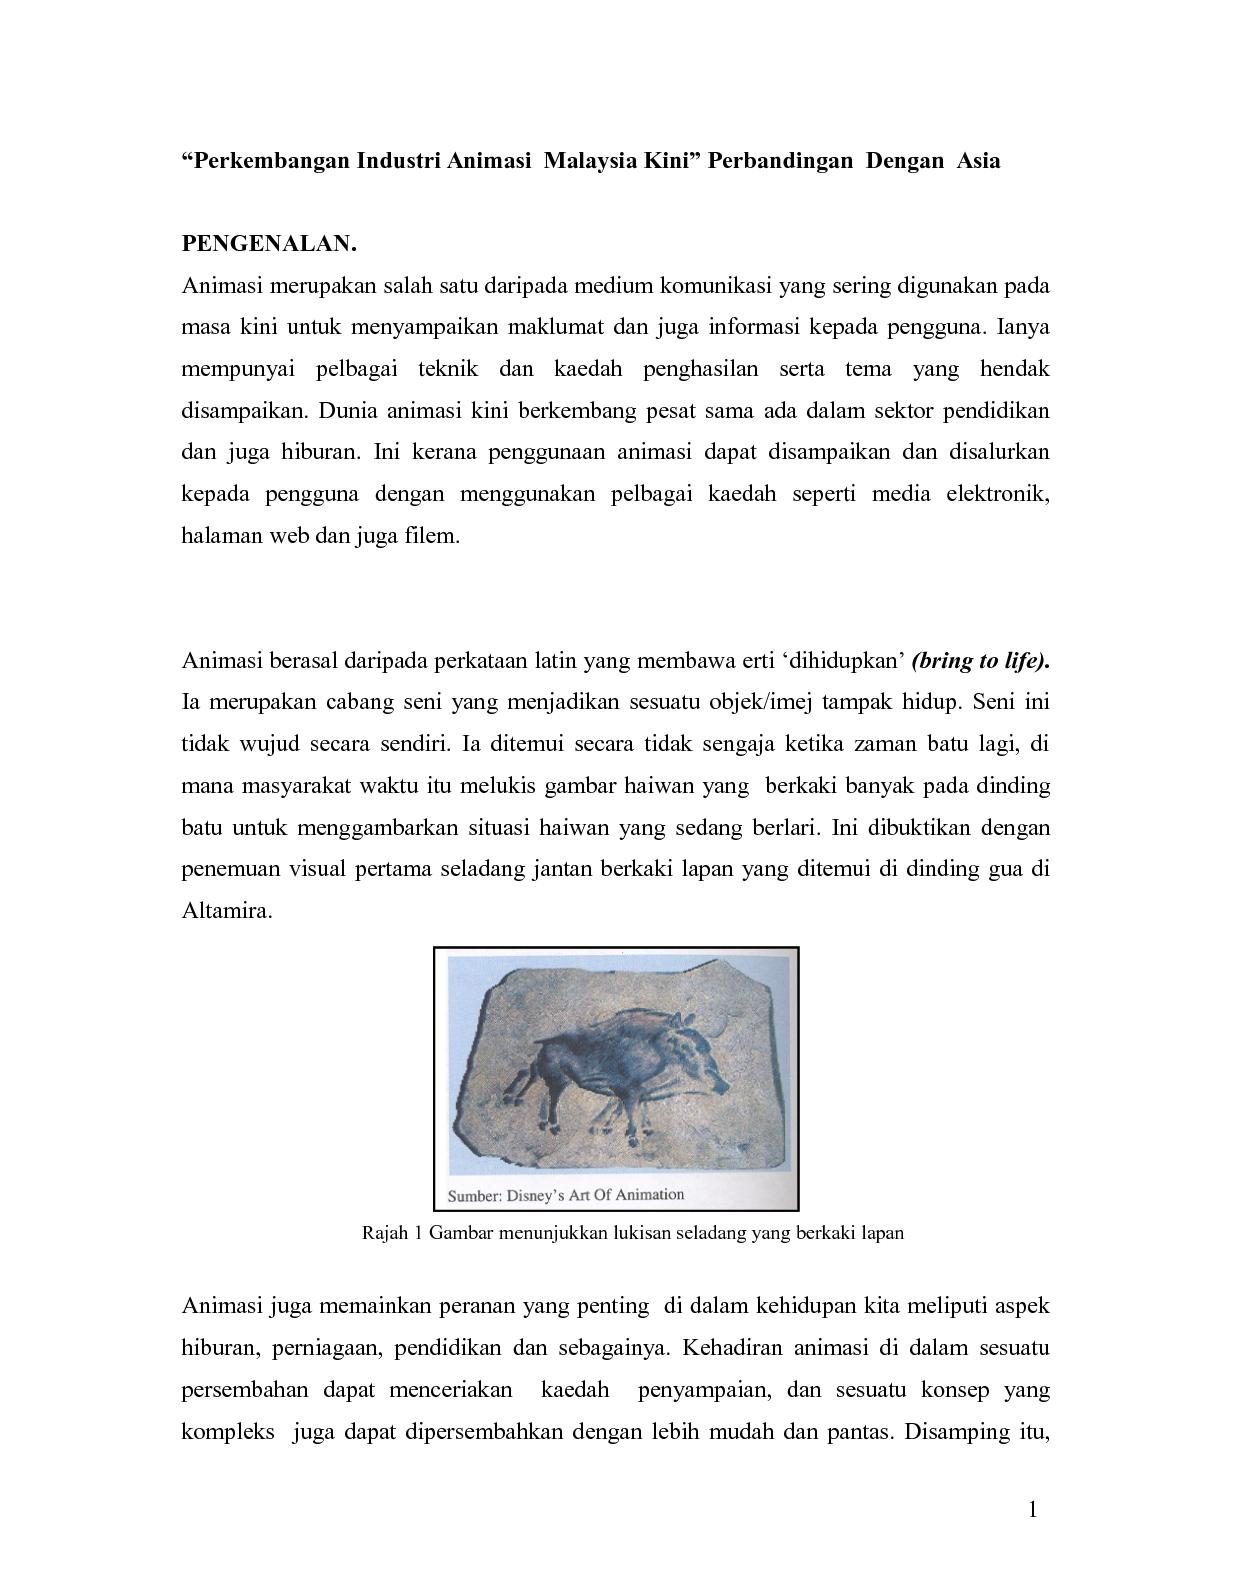 Calaméo Animasi Malaysia Kini